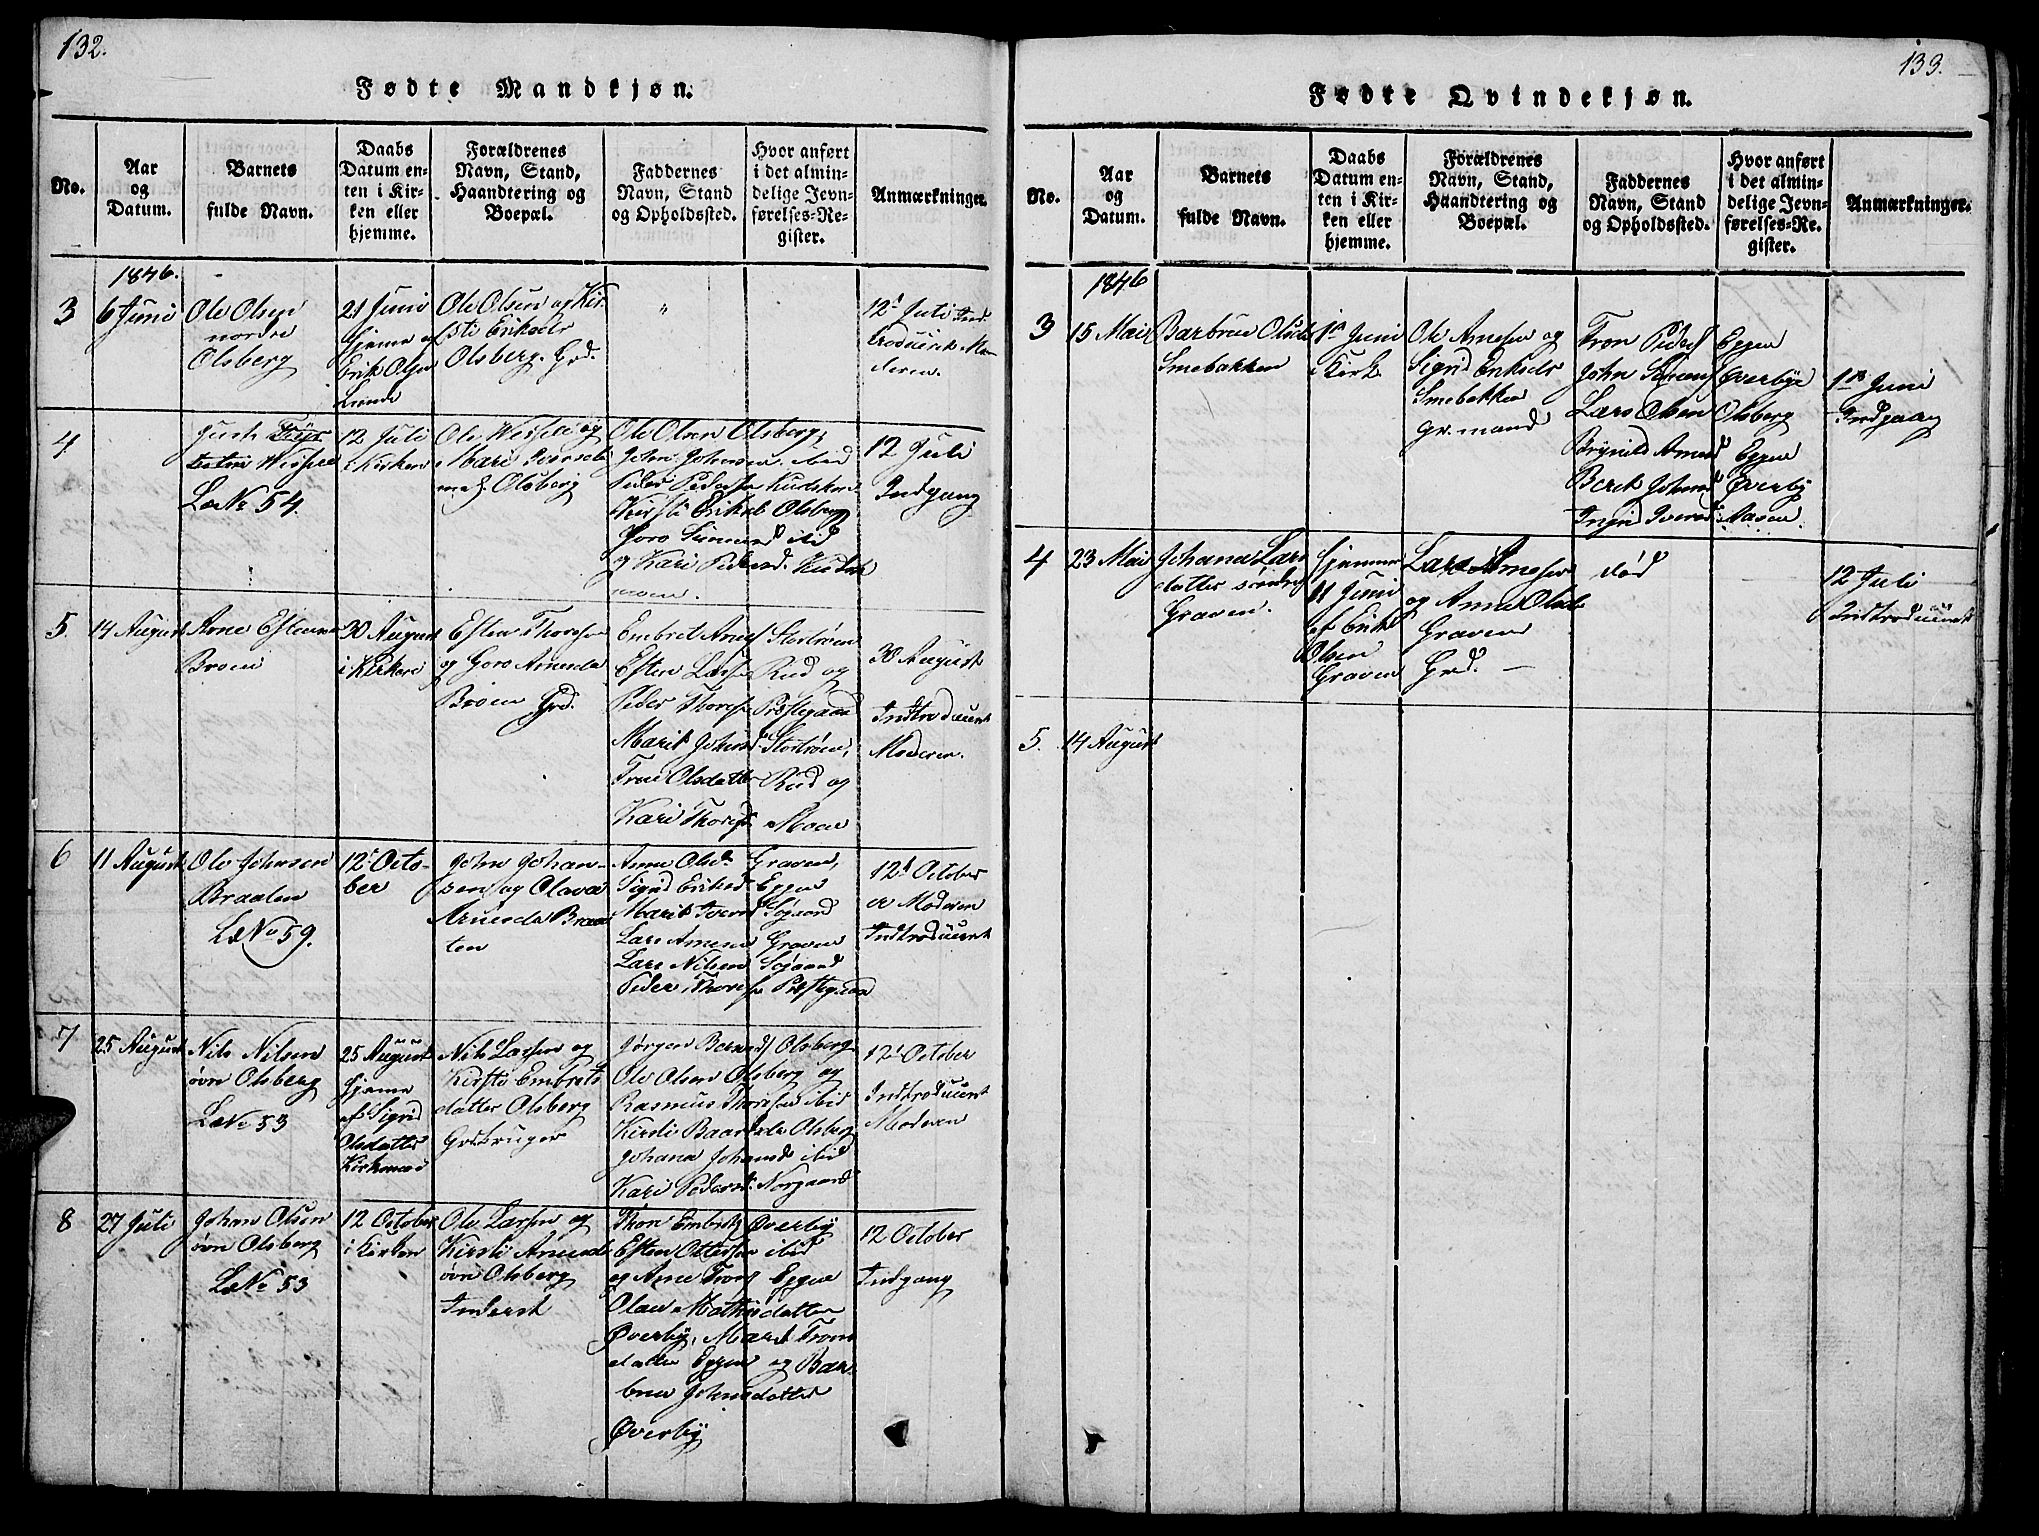 SAH, Tynset prestekontor, Klokkerbok nr. 4, 1814-1879, s. 132-133